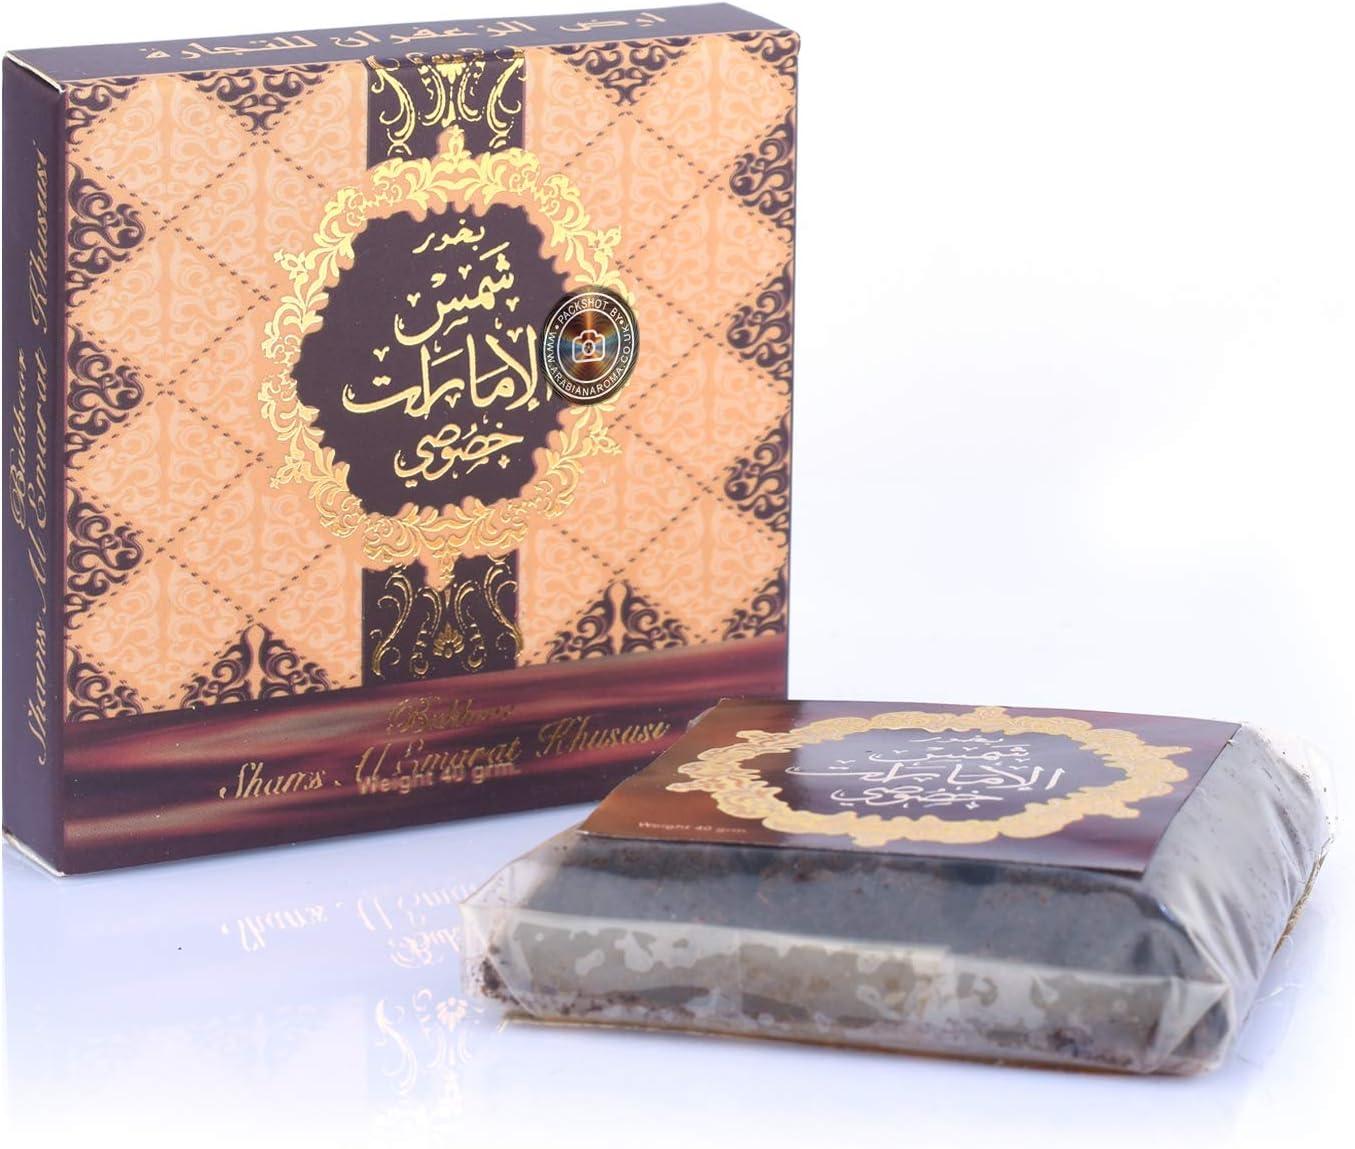 Arabian Aroma Bukhoor Shams Al Emarat Khususi 40 G